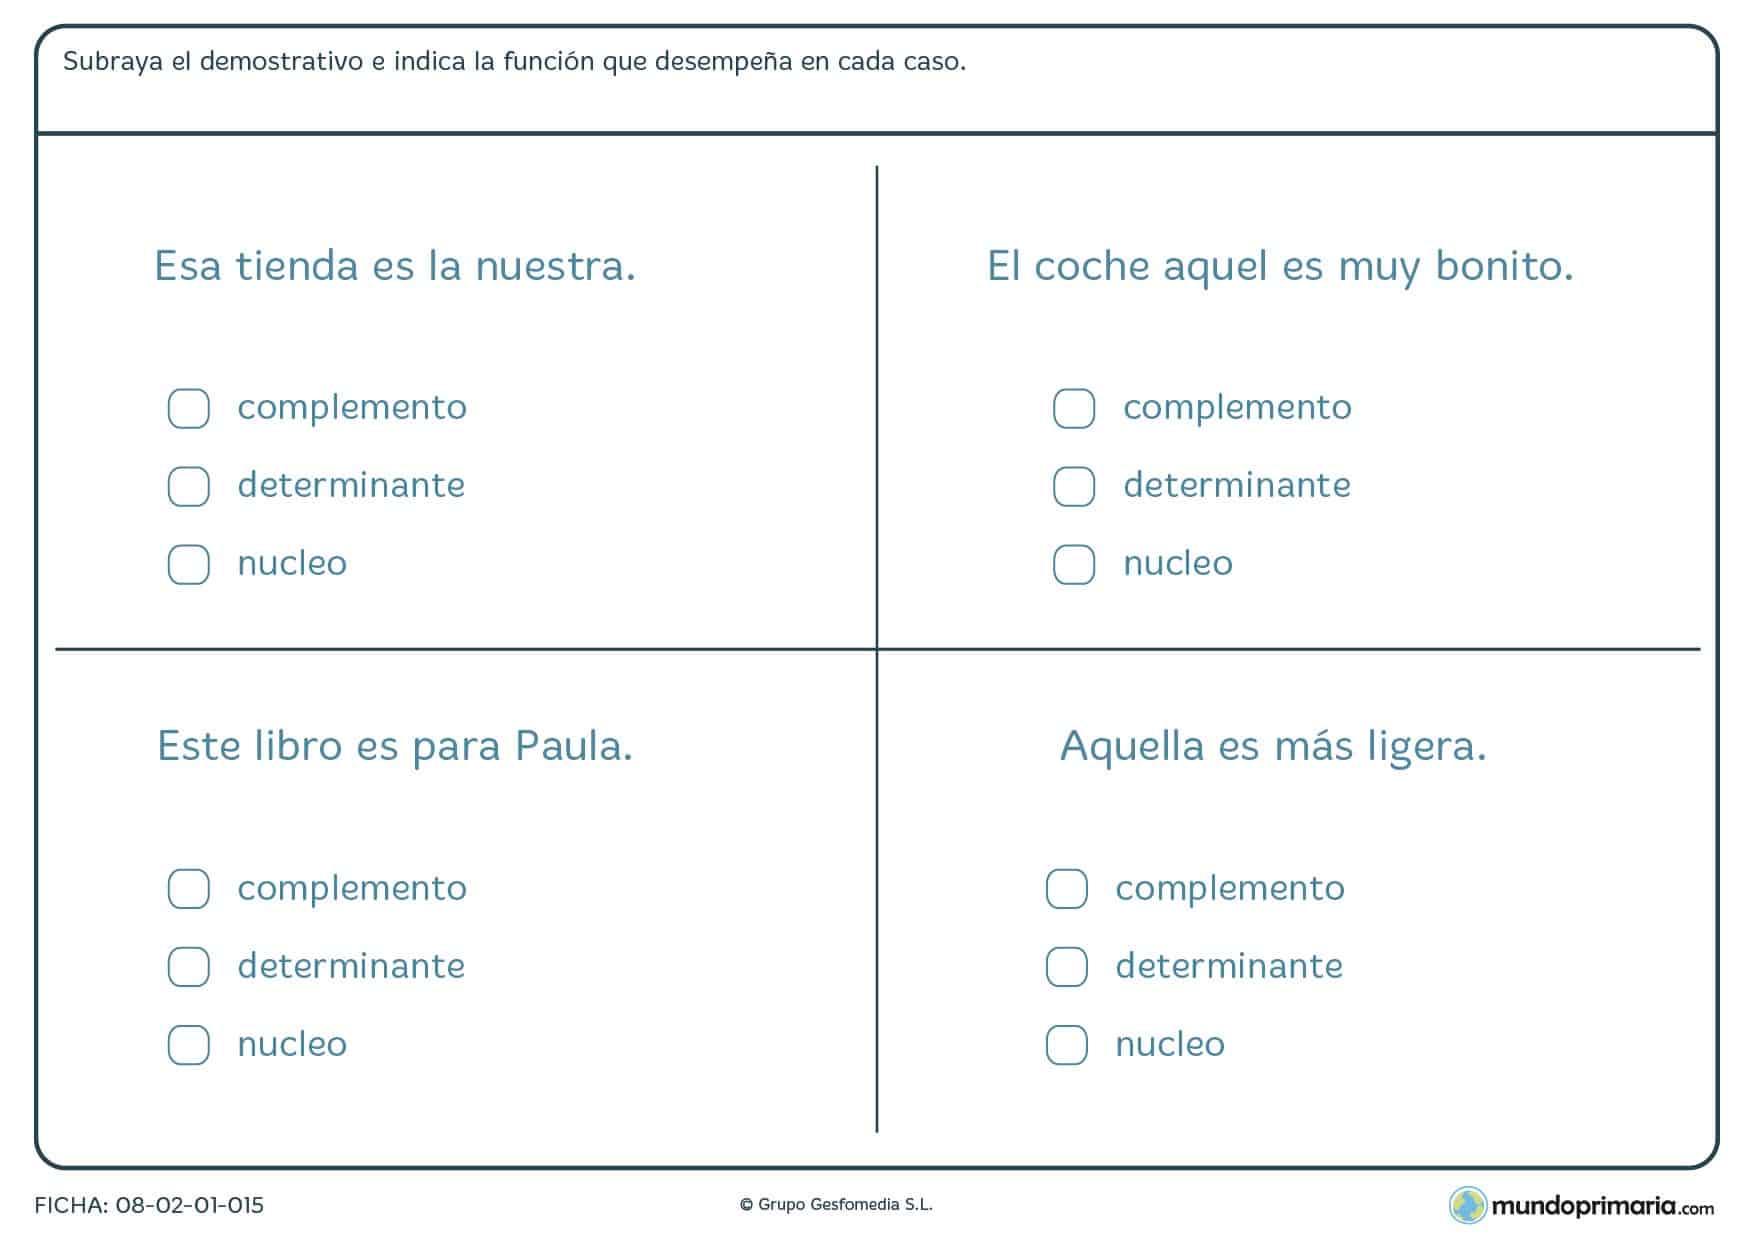 Ficha de lenguaje de gramática de demostrativos para Primaria